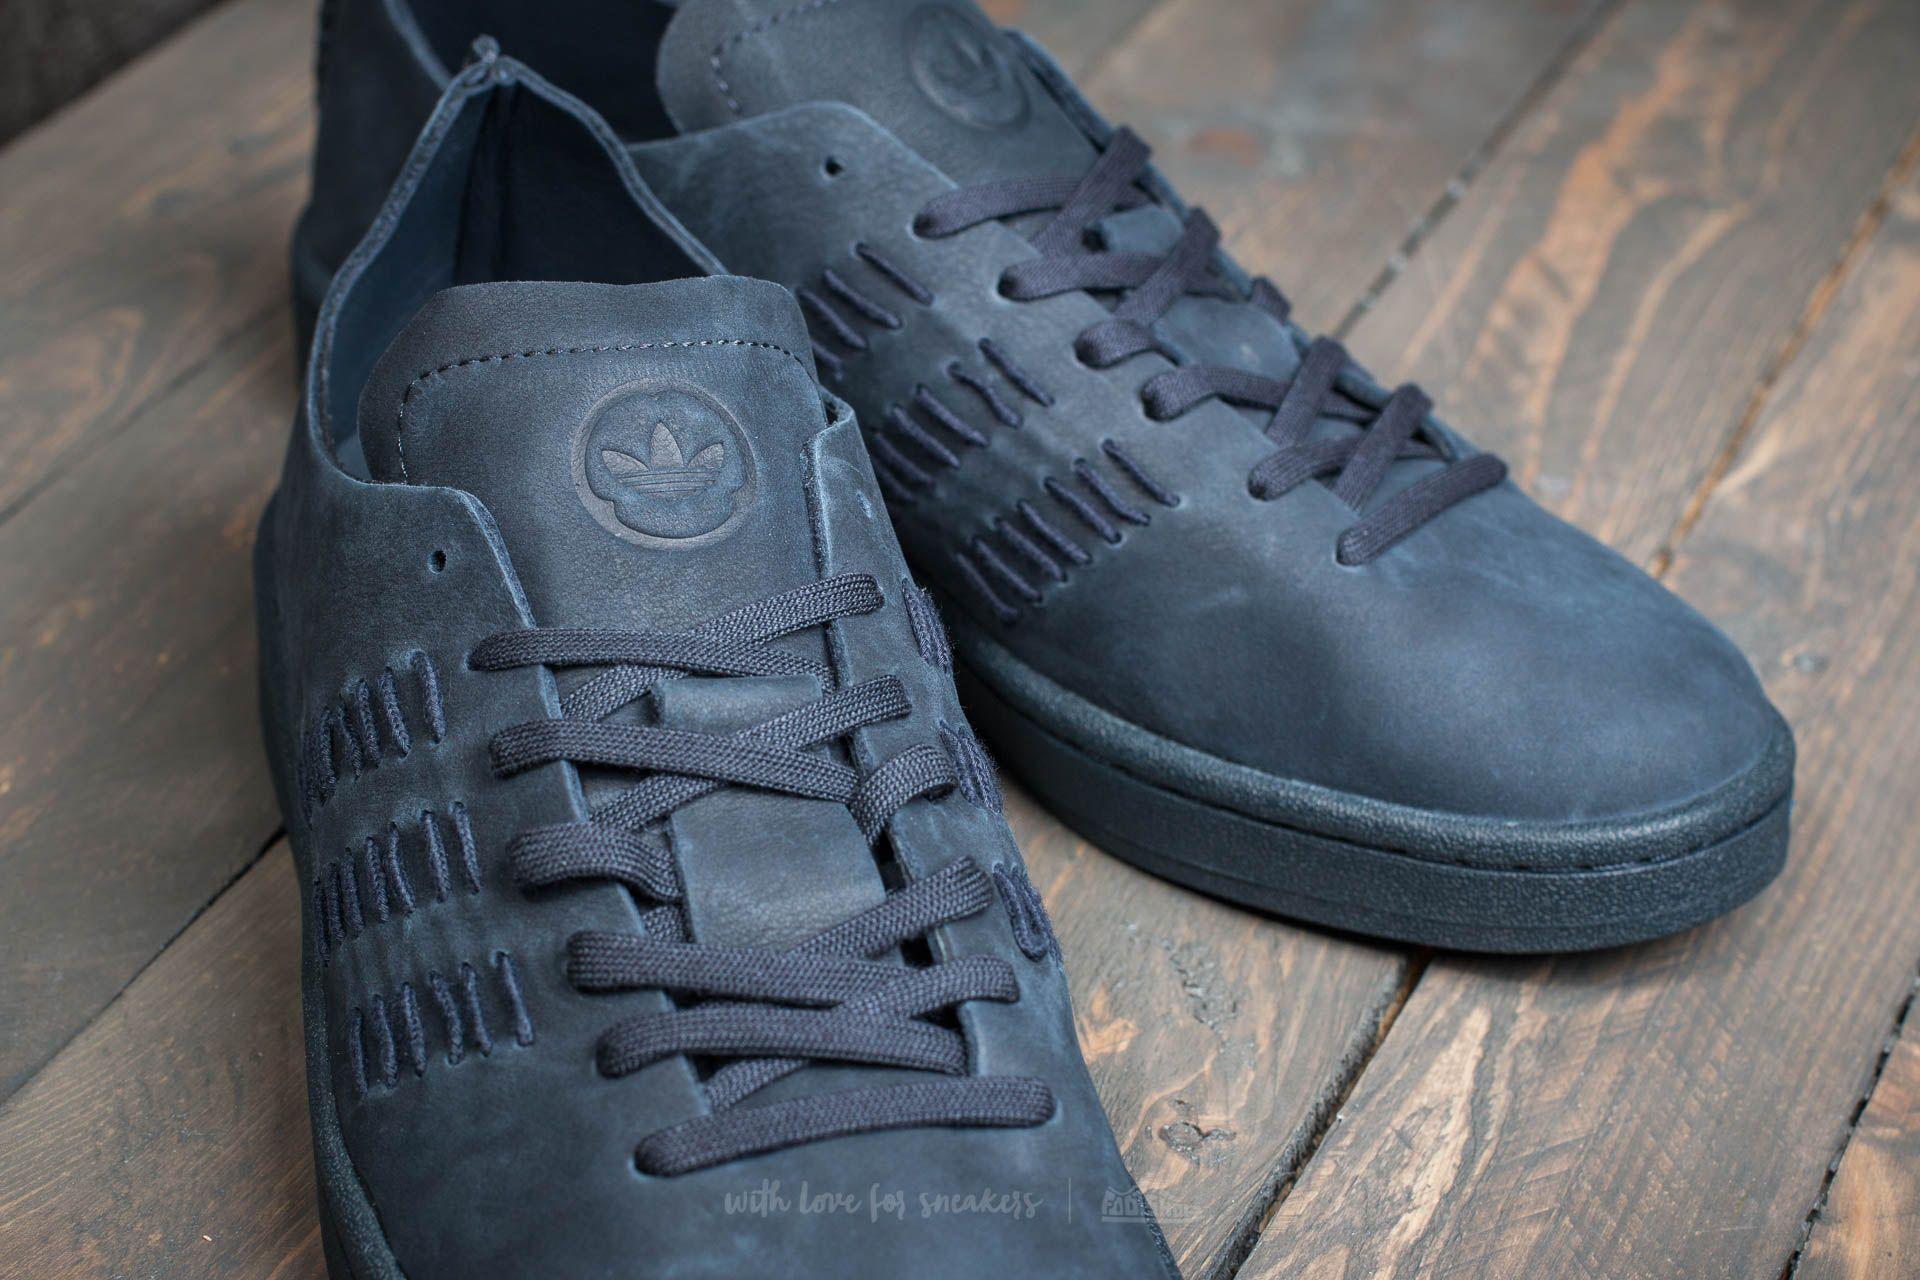 sports shoes 3e464 7ac1c Lyst - adidas Originals Adidas X Wings +horns Campus Night N